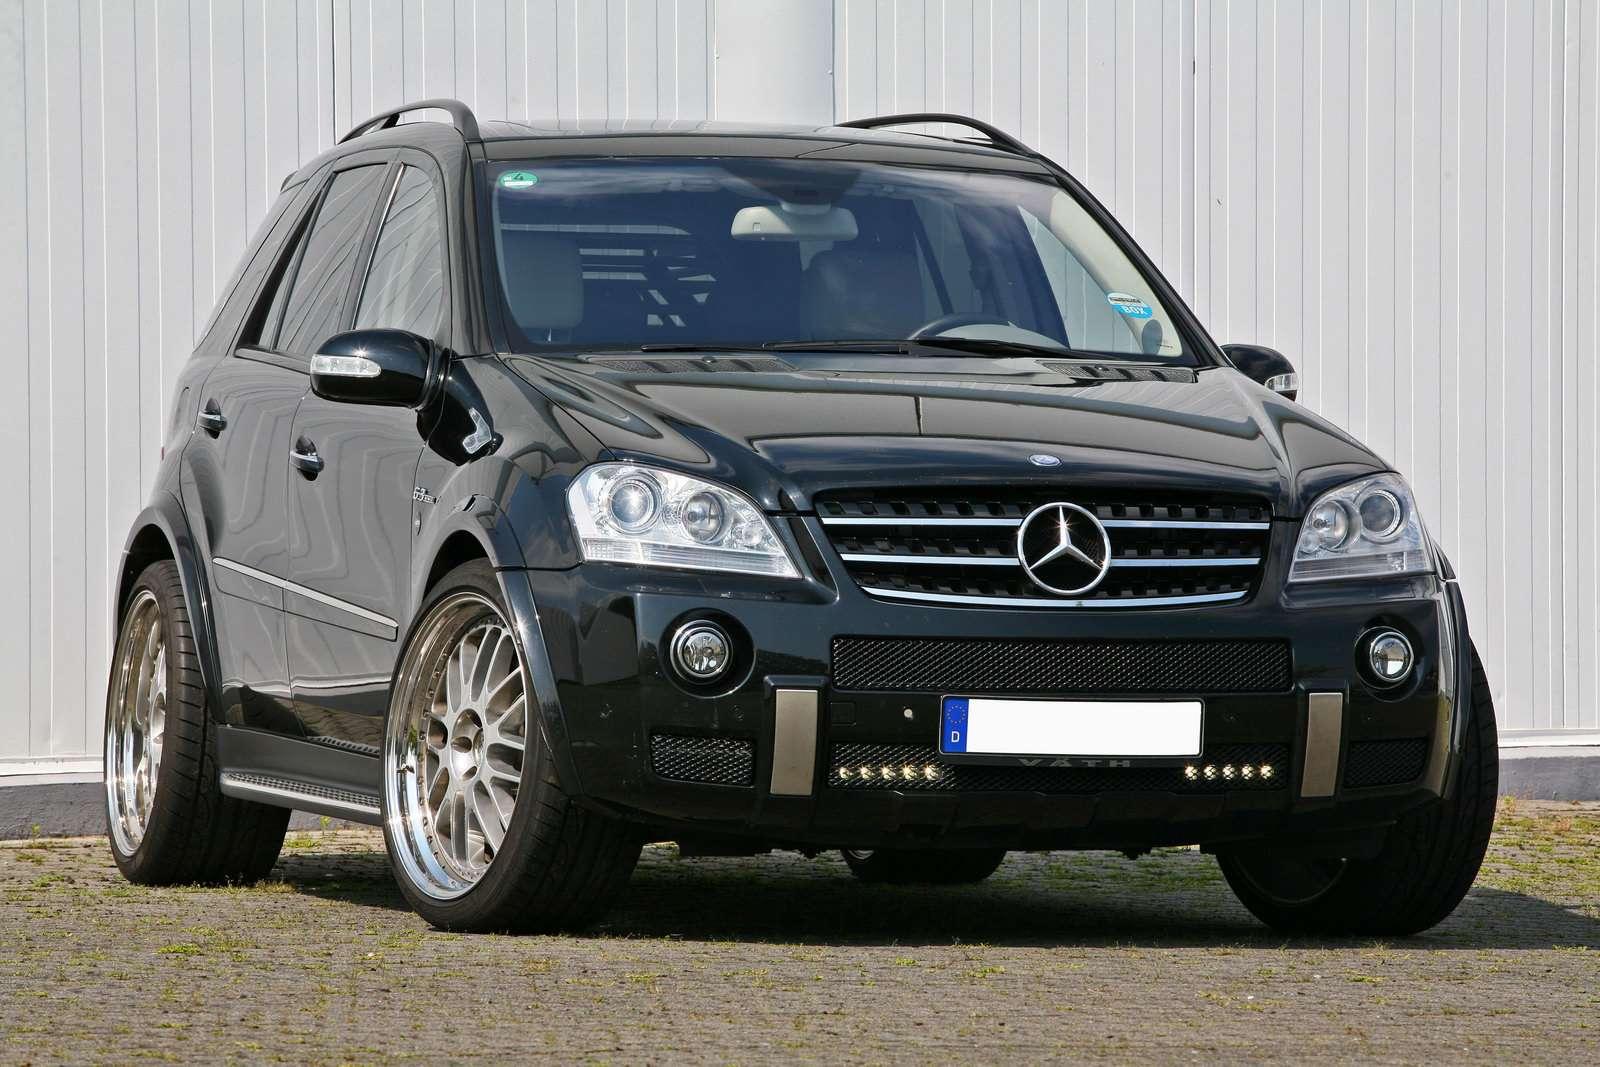 Mercedes ML 63 AMG VATH 2009